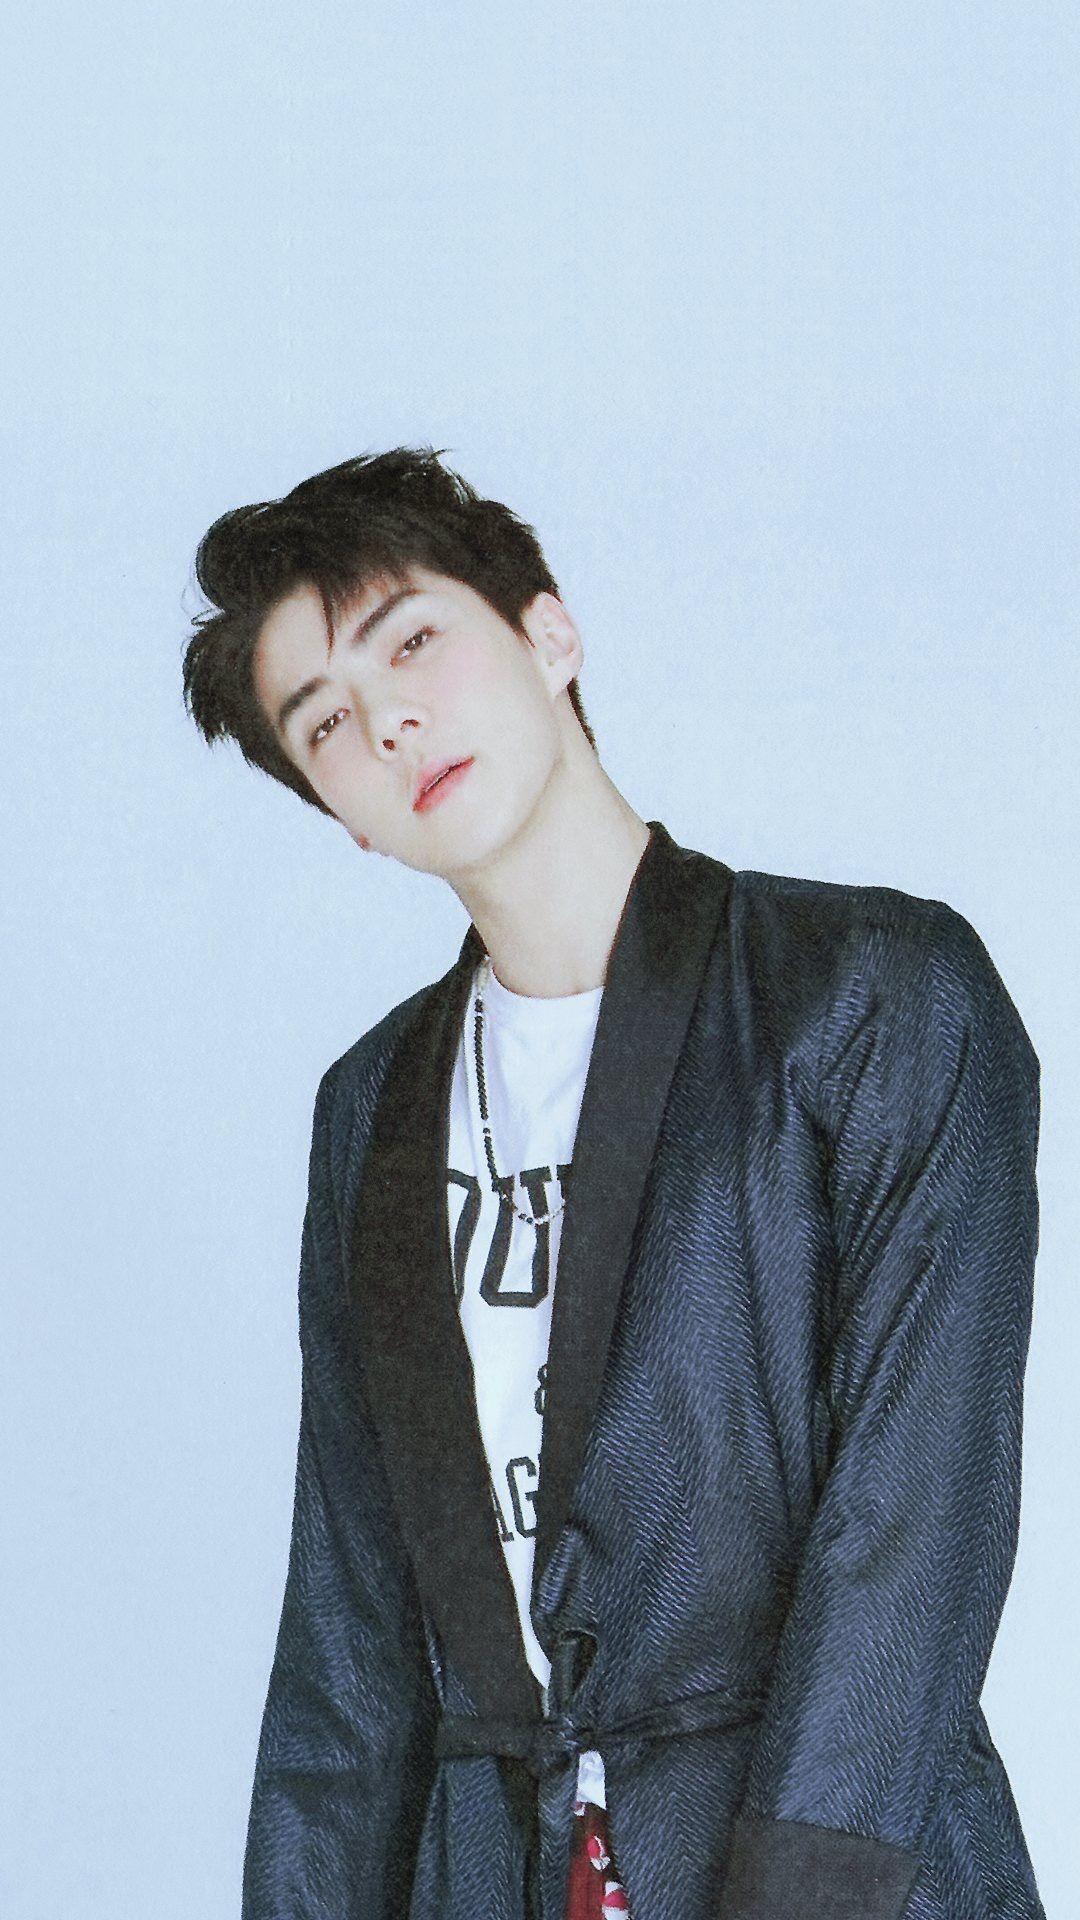 D O Sehun And Exo Wallpaper - Vtwctr